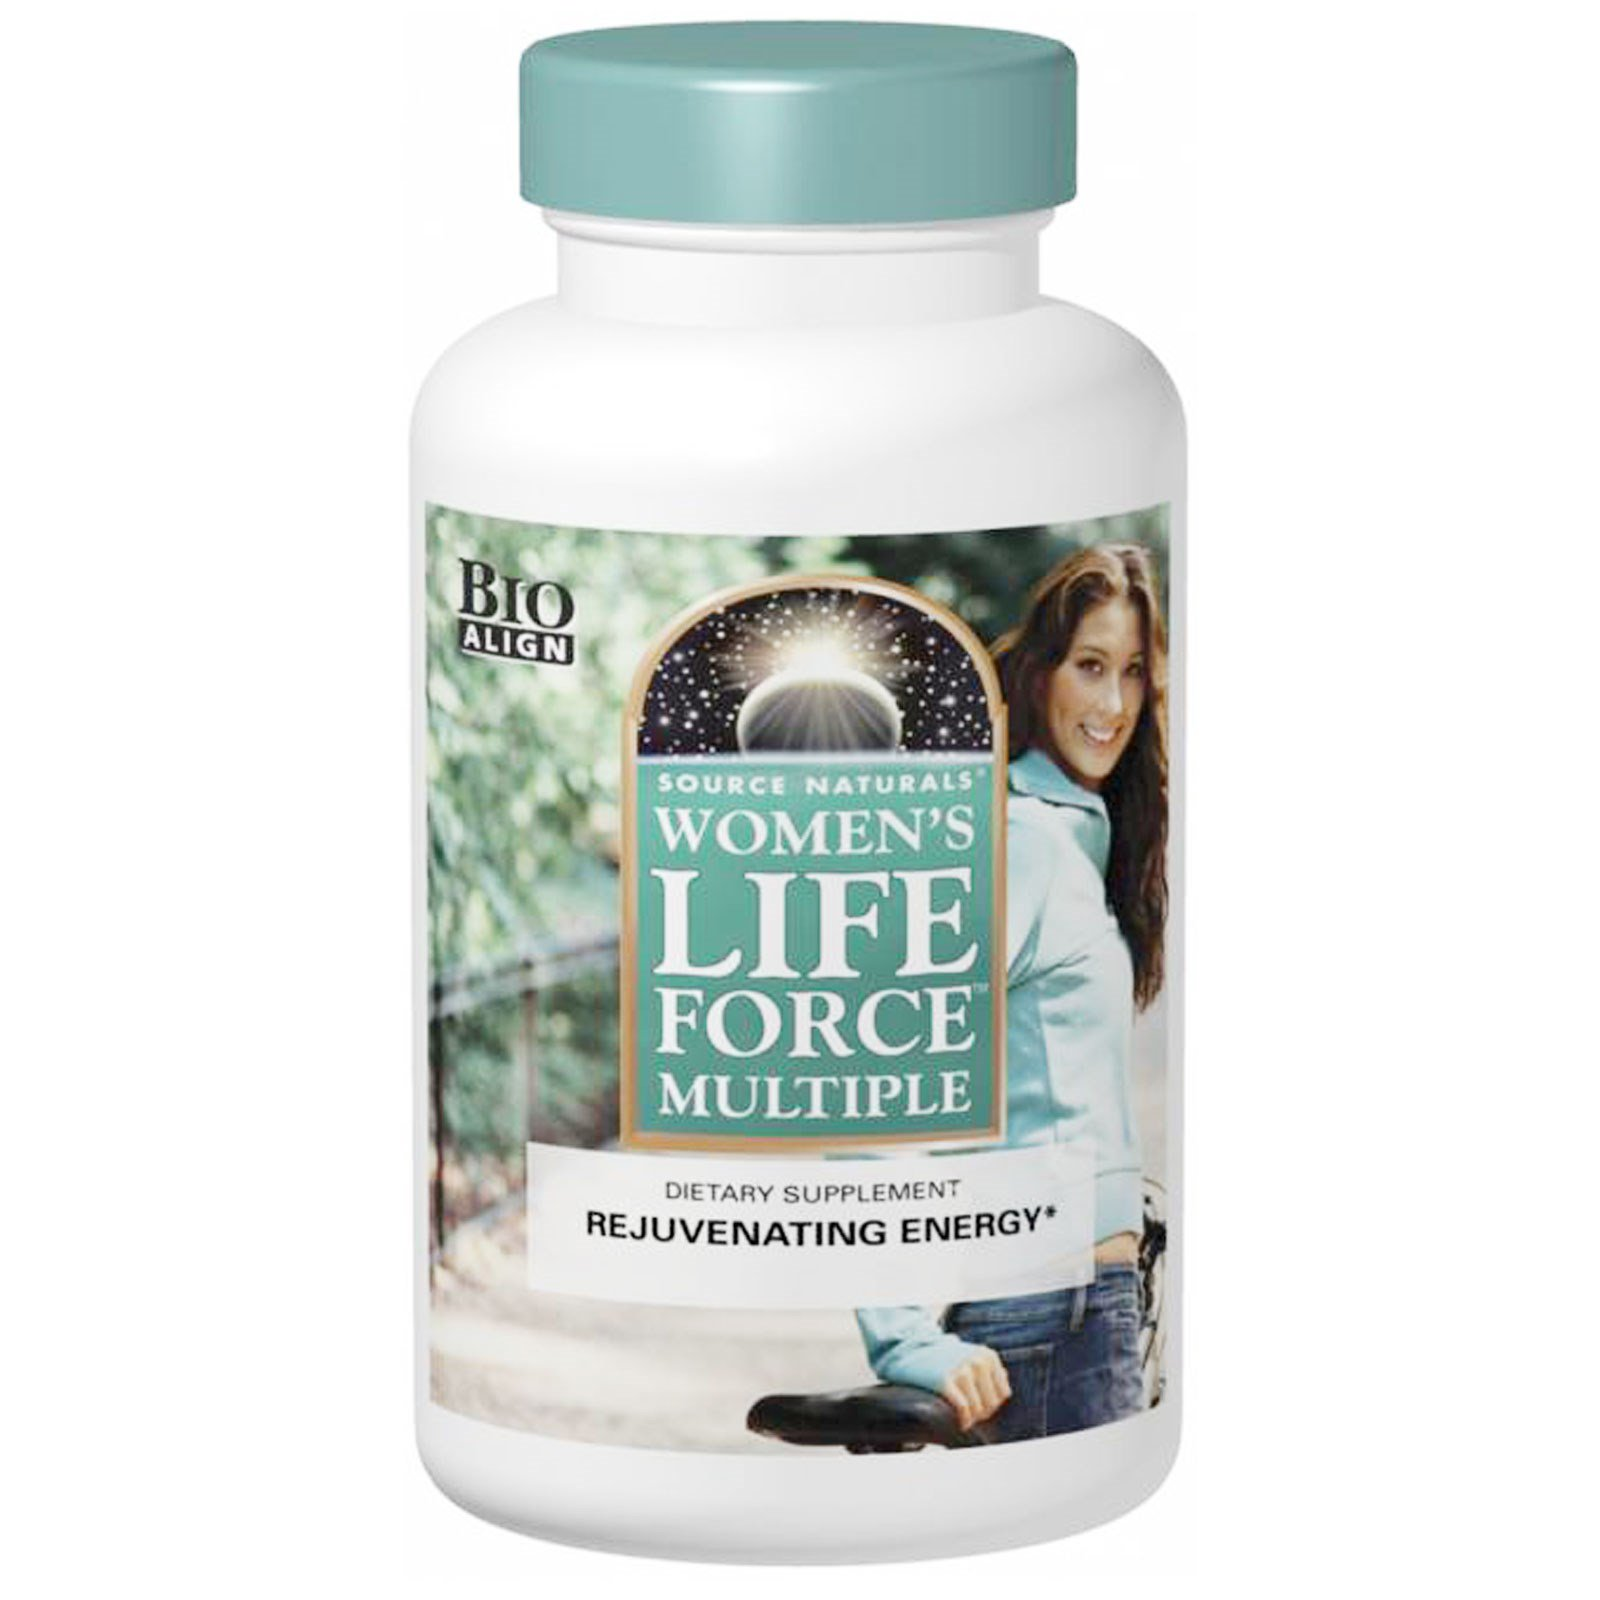 Source Naturals, Женская жизненная сила, 180 таблеток